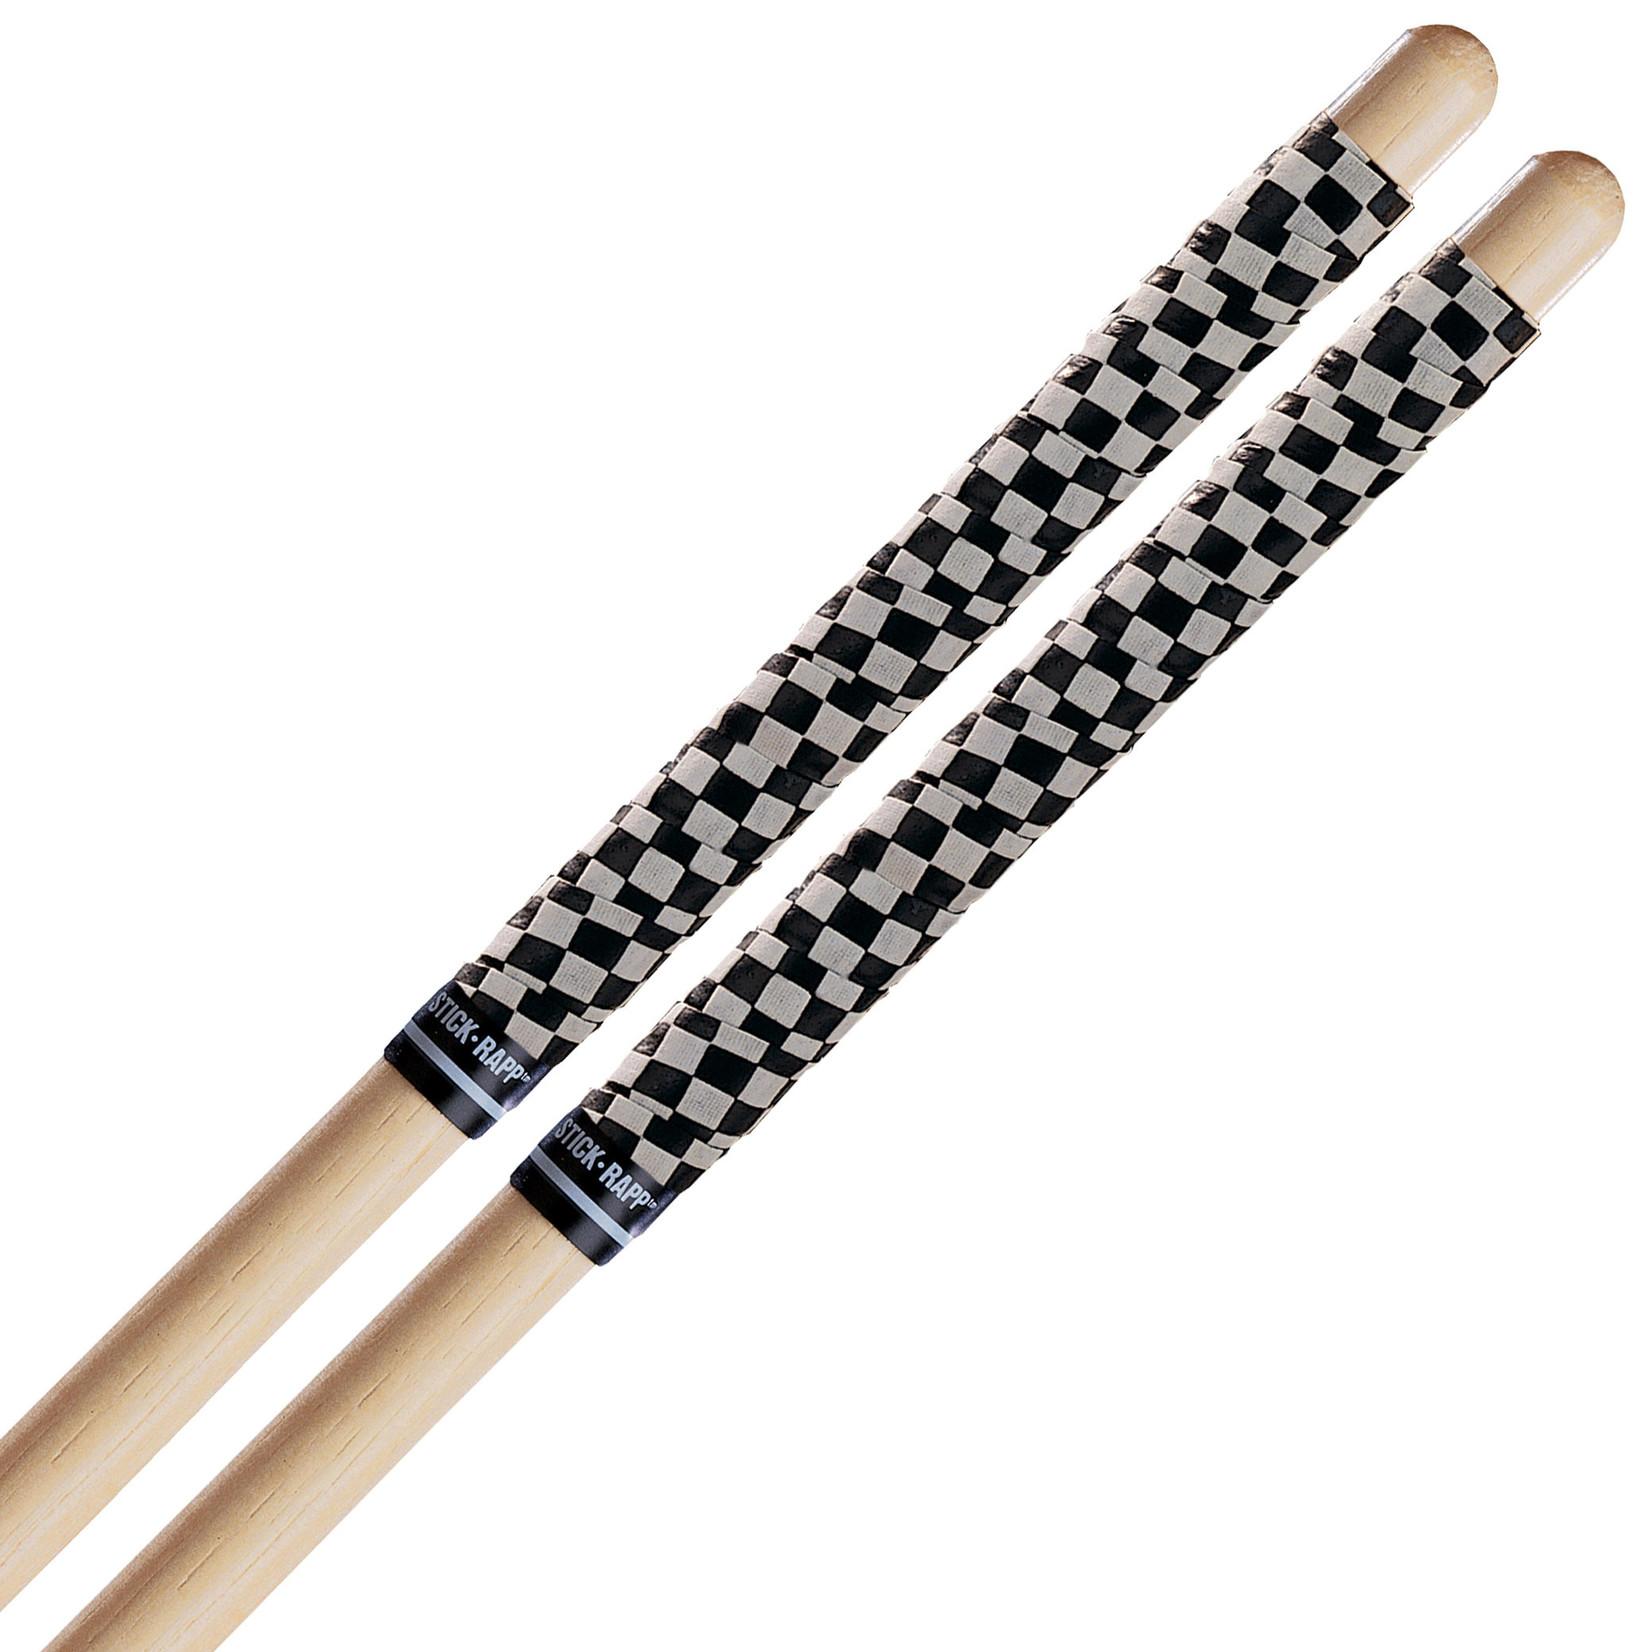 Promark Promark Stick Rapp - Check White/Black